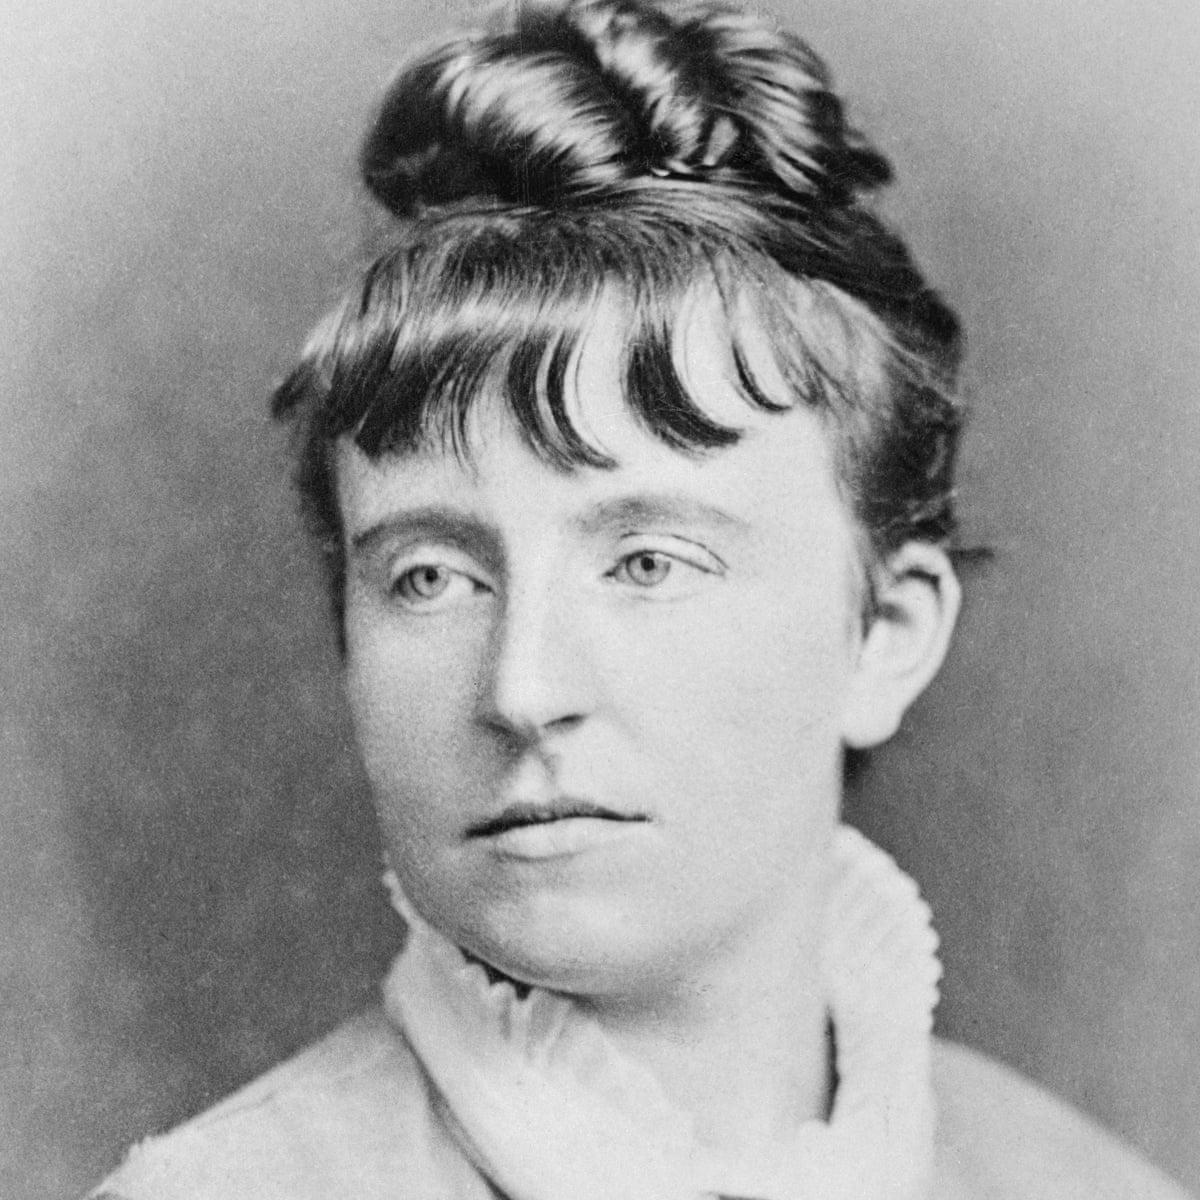 Retrato de Frances Hodgson Burnett.